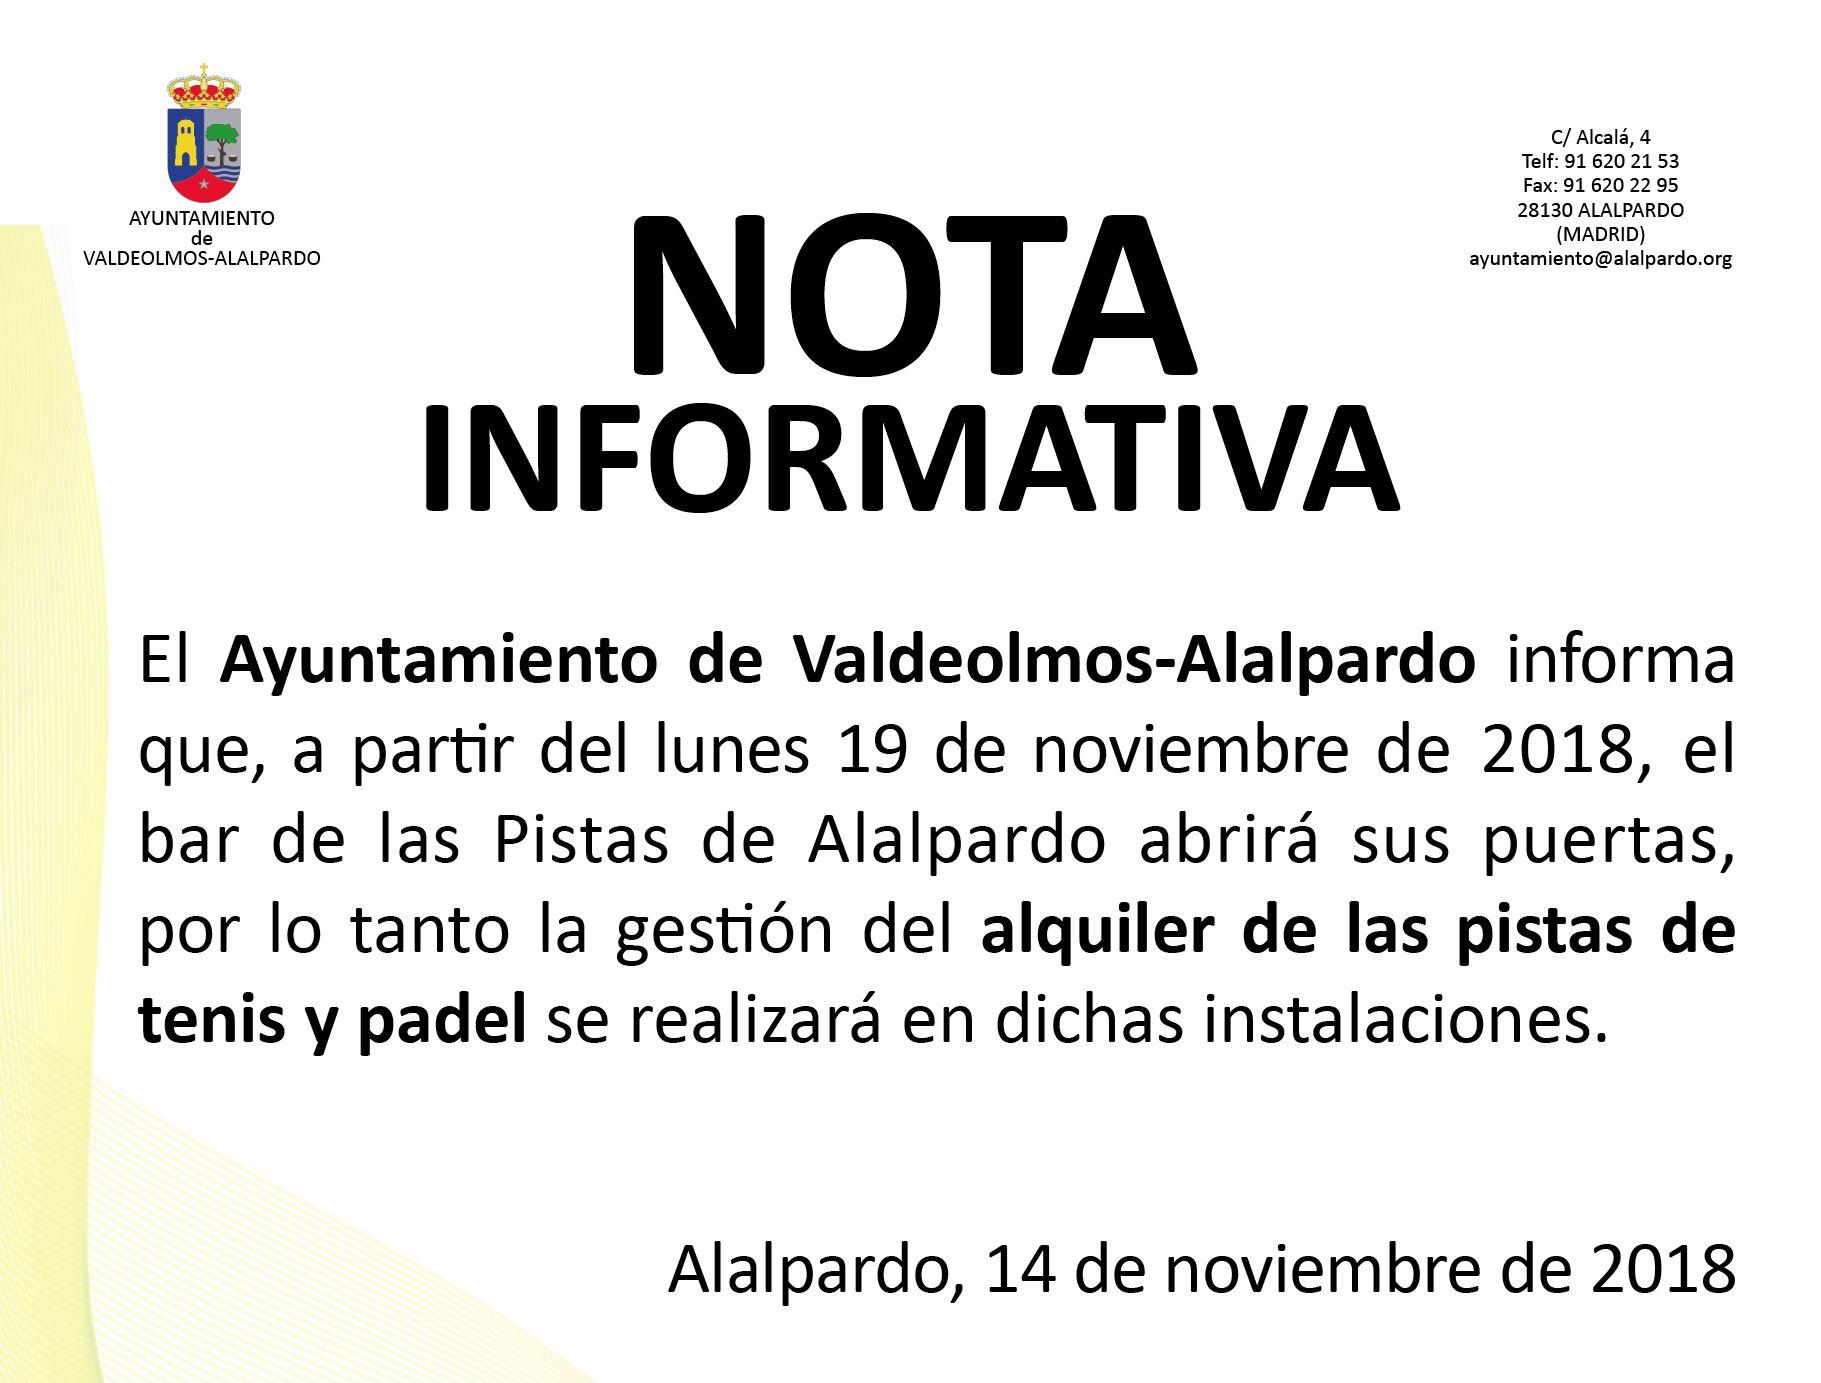 Nota Informativa - ALQUILER PISTAS TENIS y PÁDEL